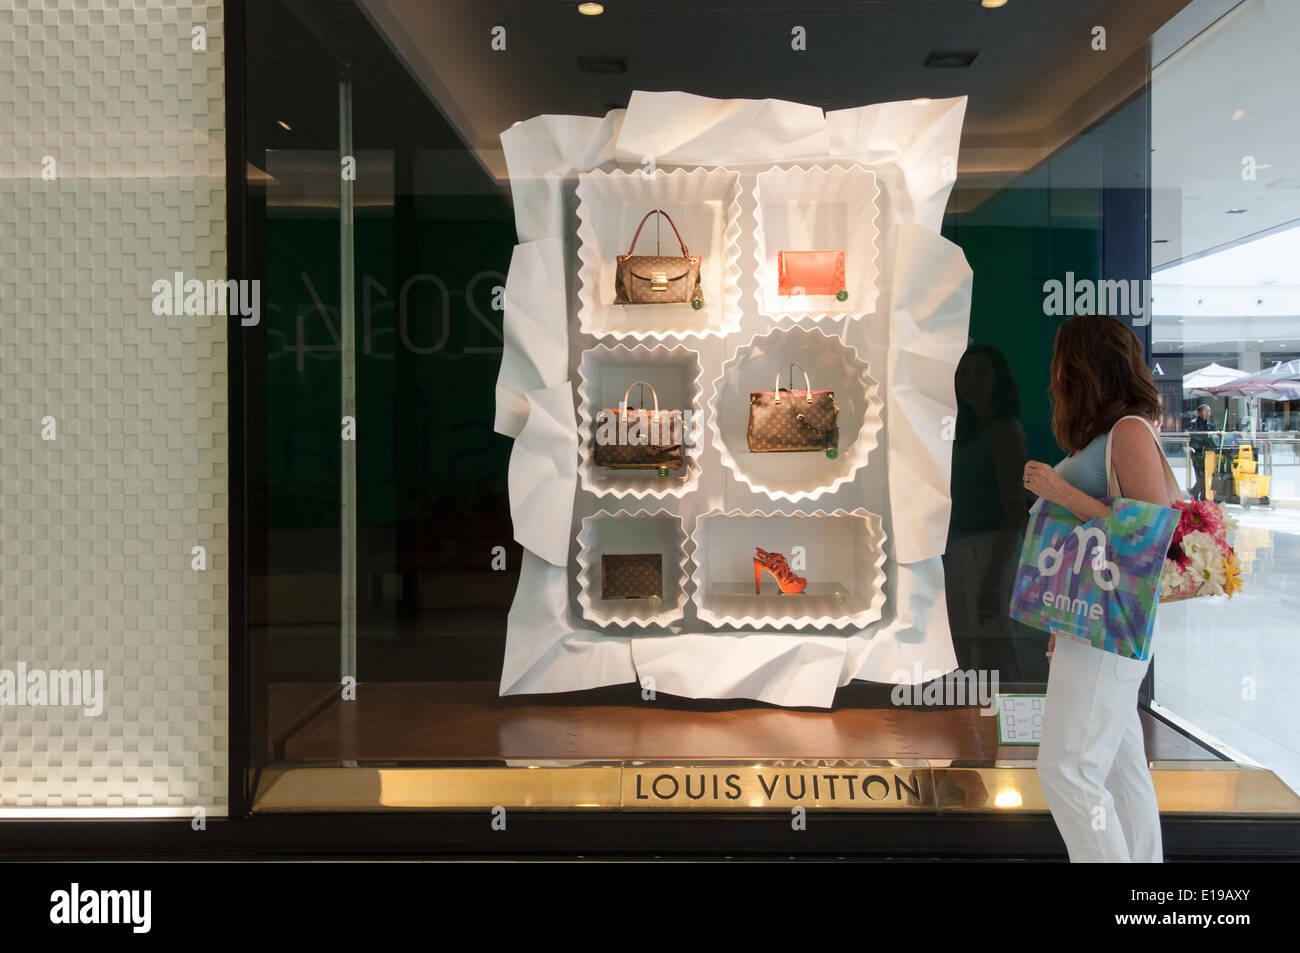 Luxurious stores Iguatemi Shopping center Brasilia Brazil - Stock Image